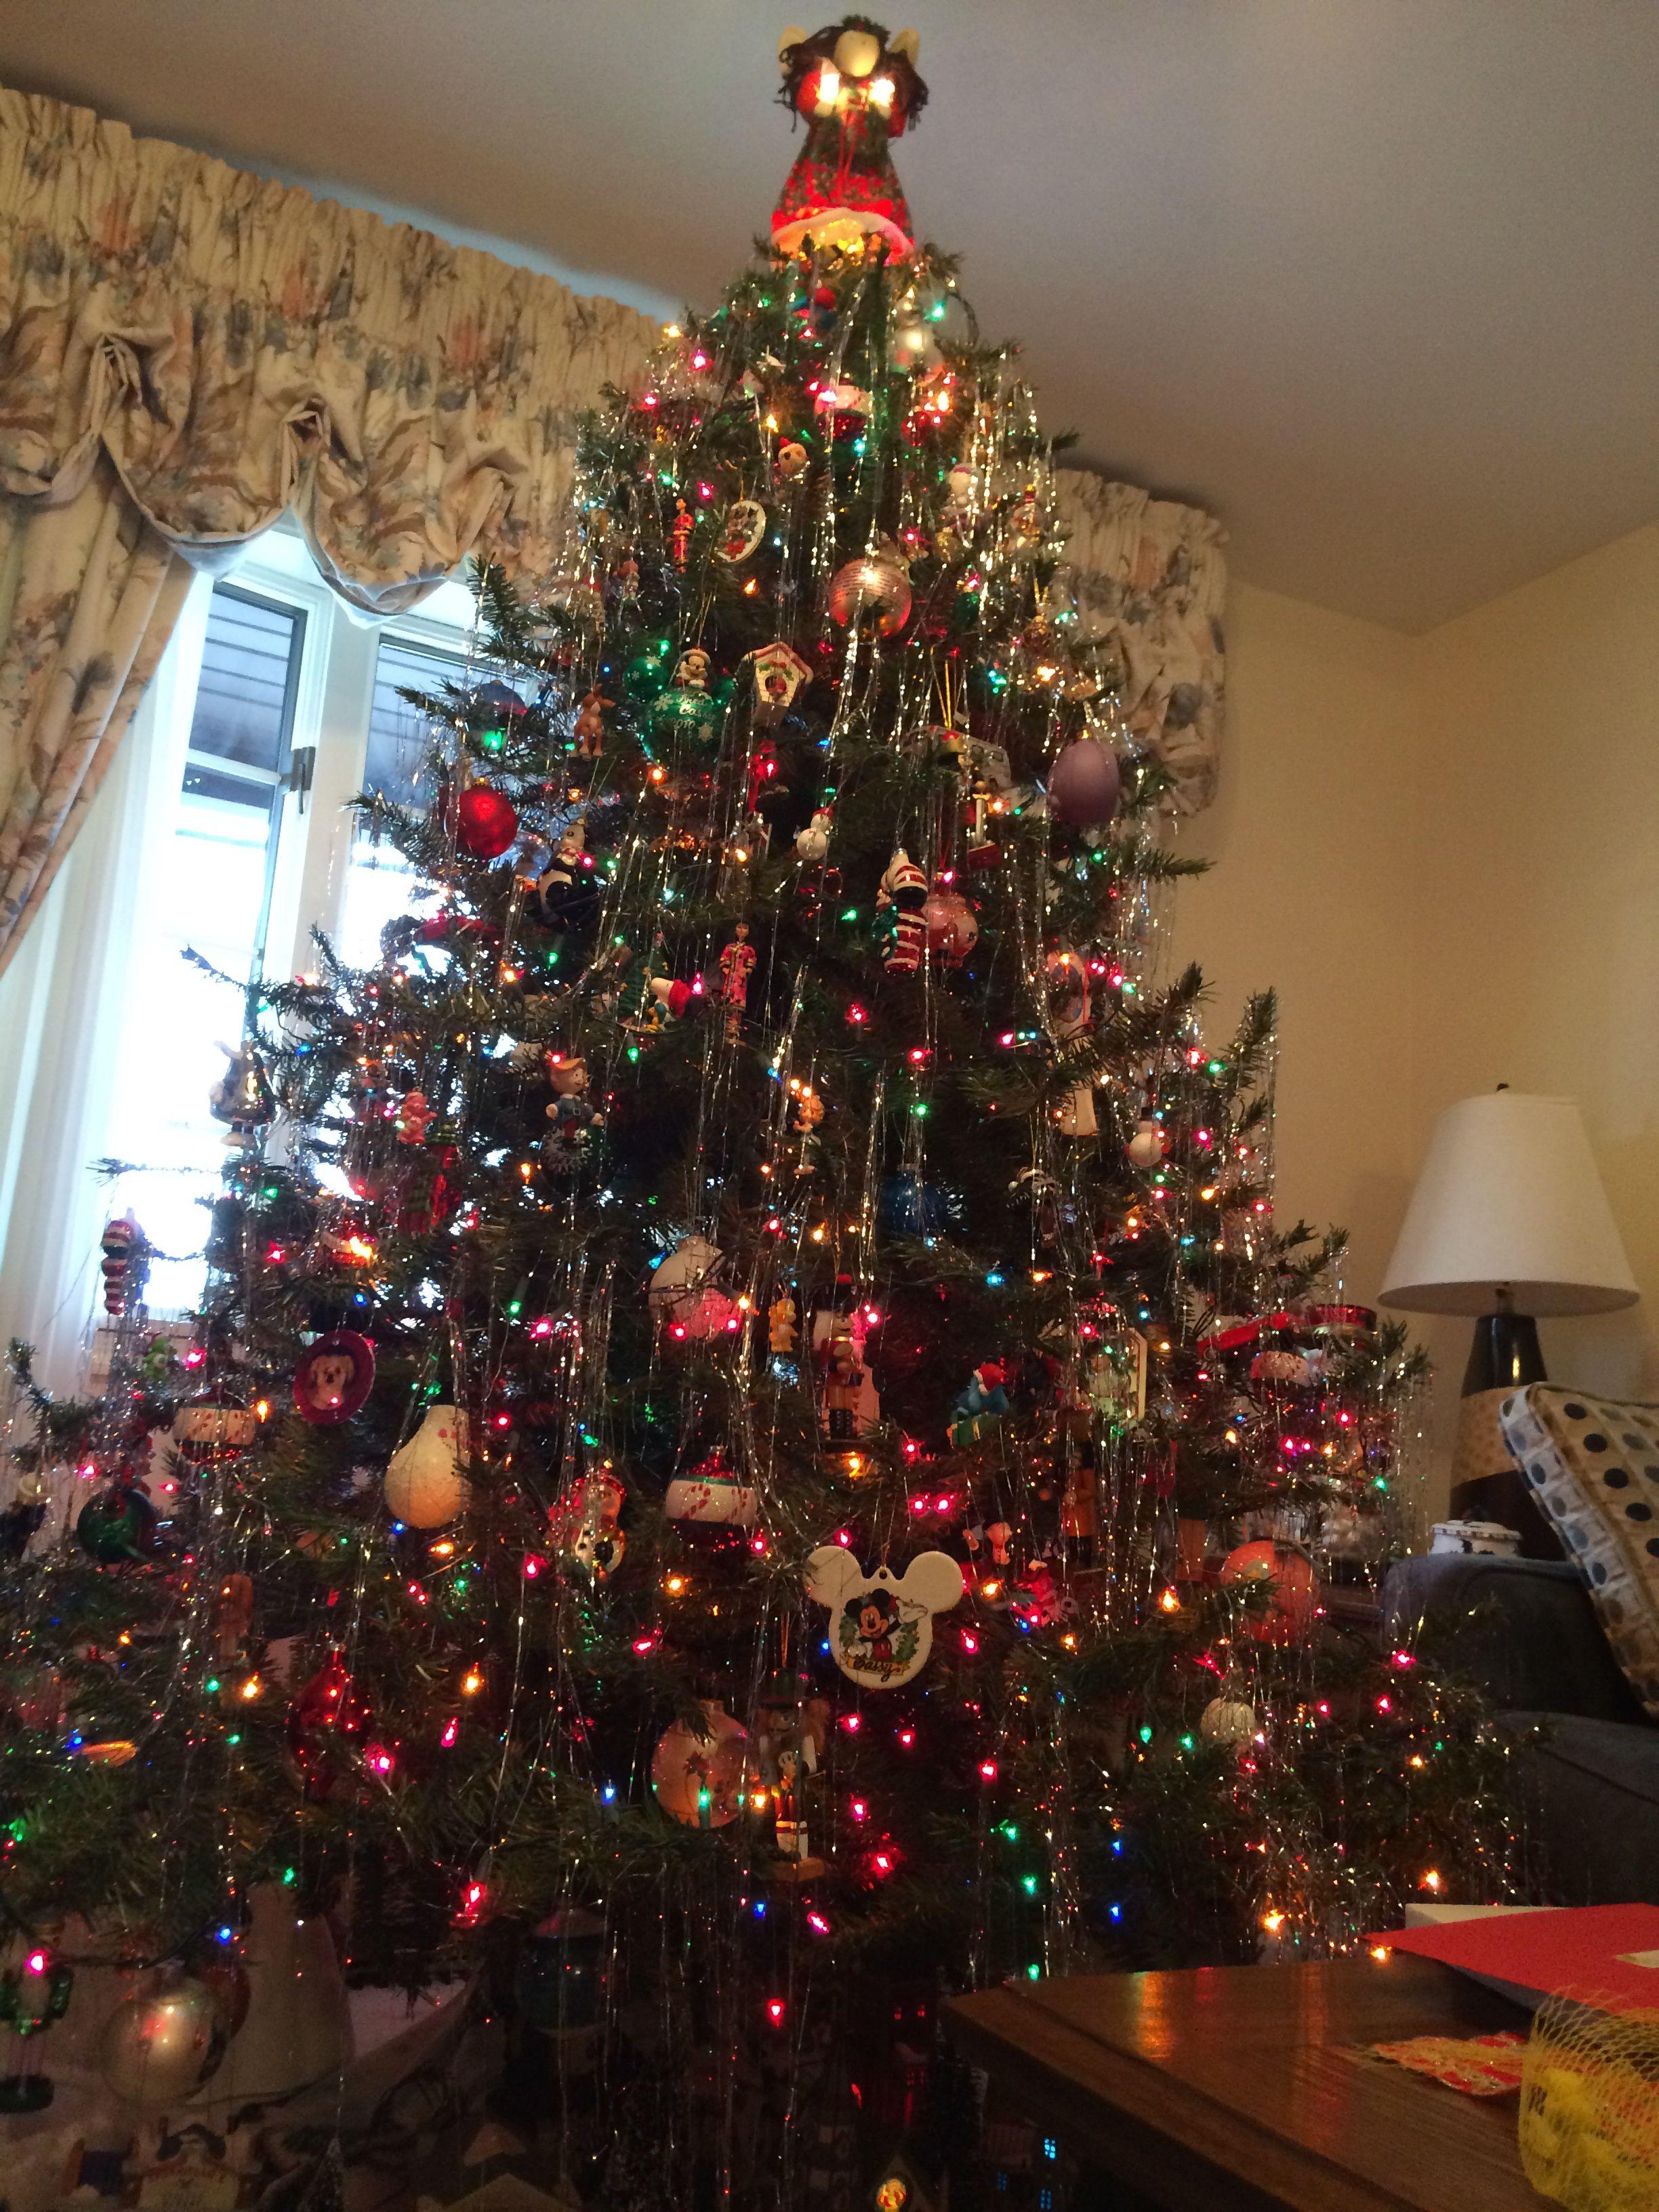 Merry Christmas!!!! :)